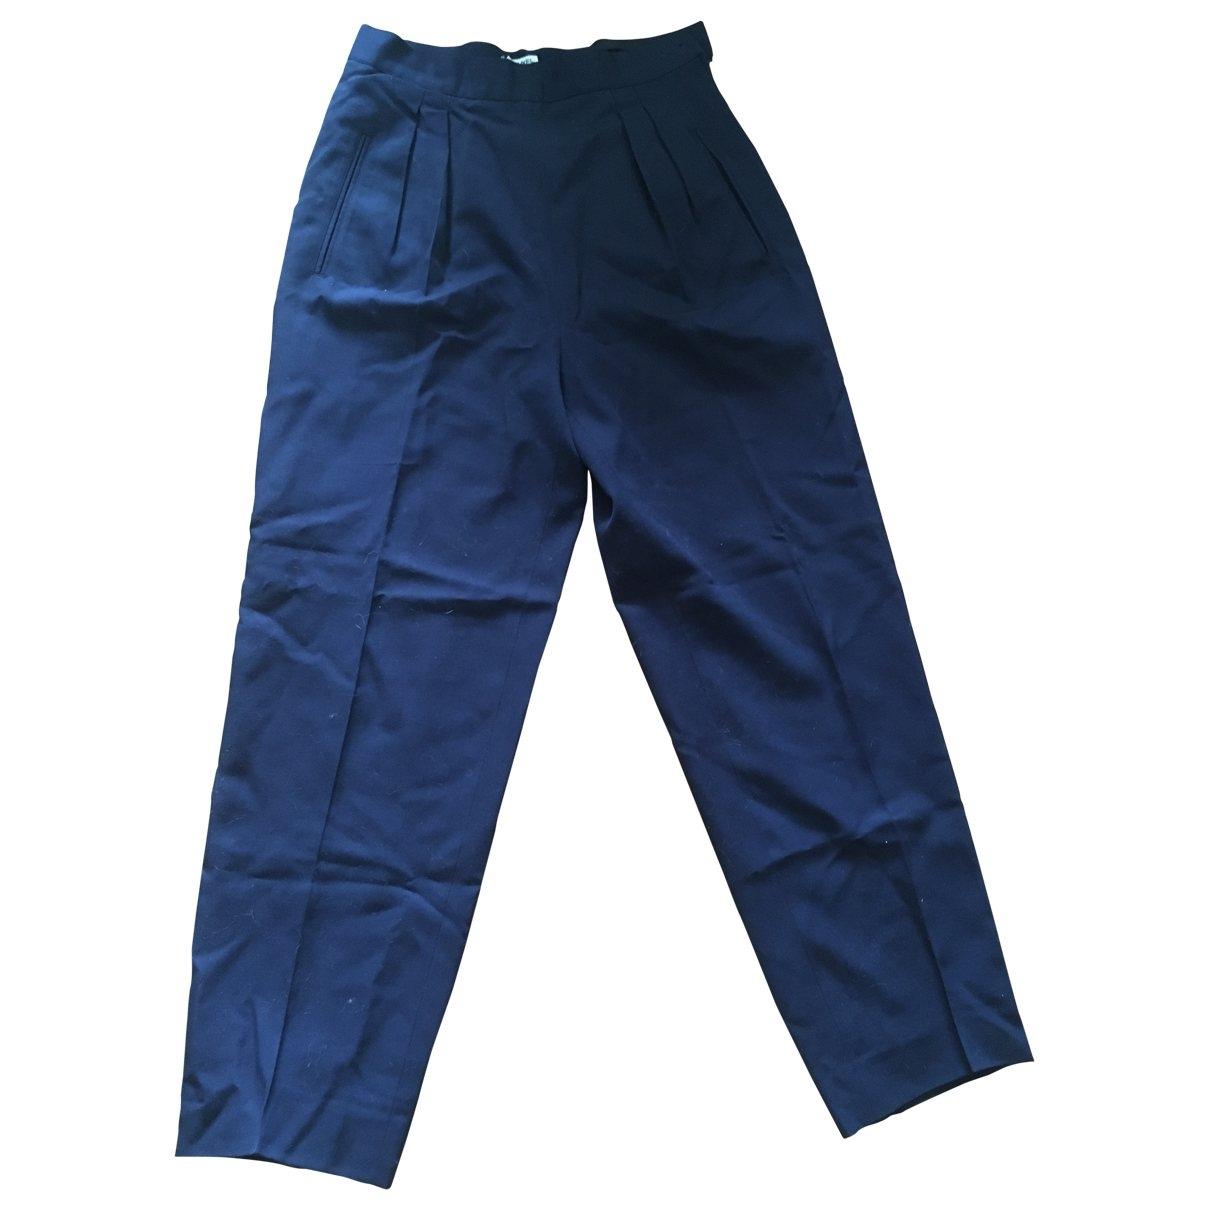 Chanel \N Navy Wool Trousers for Women 38 FR